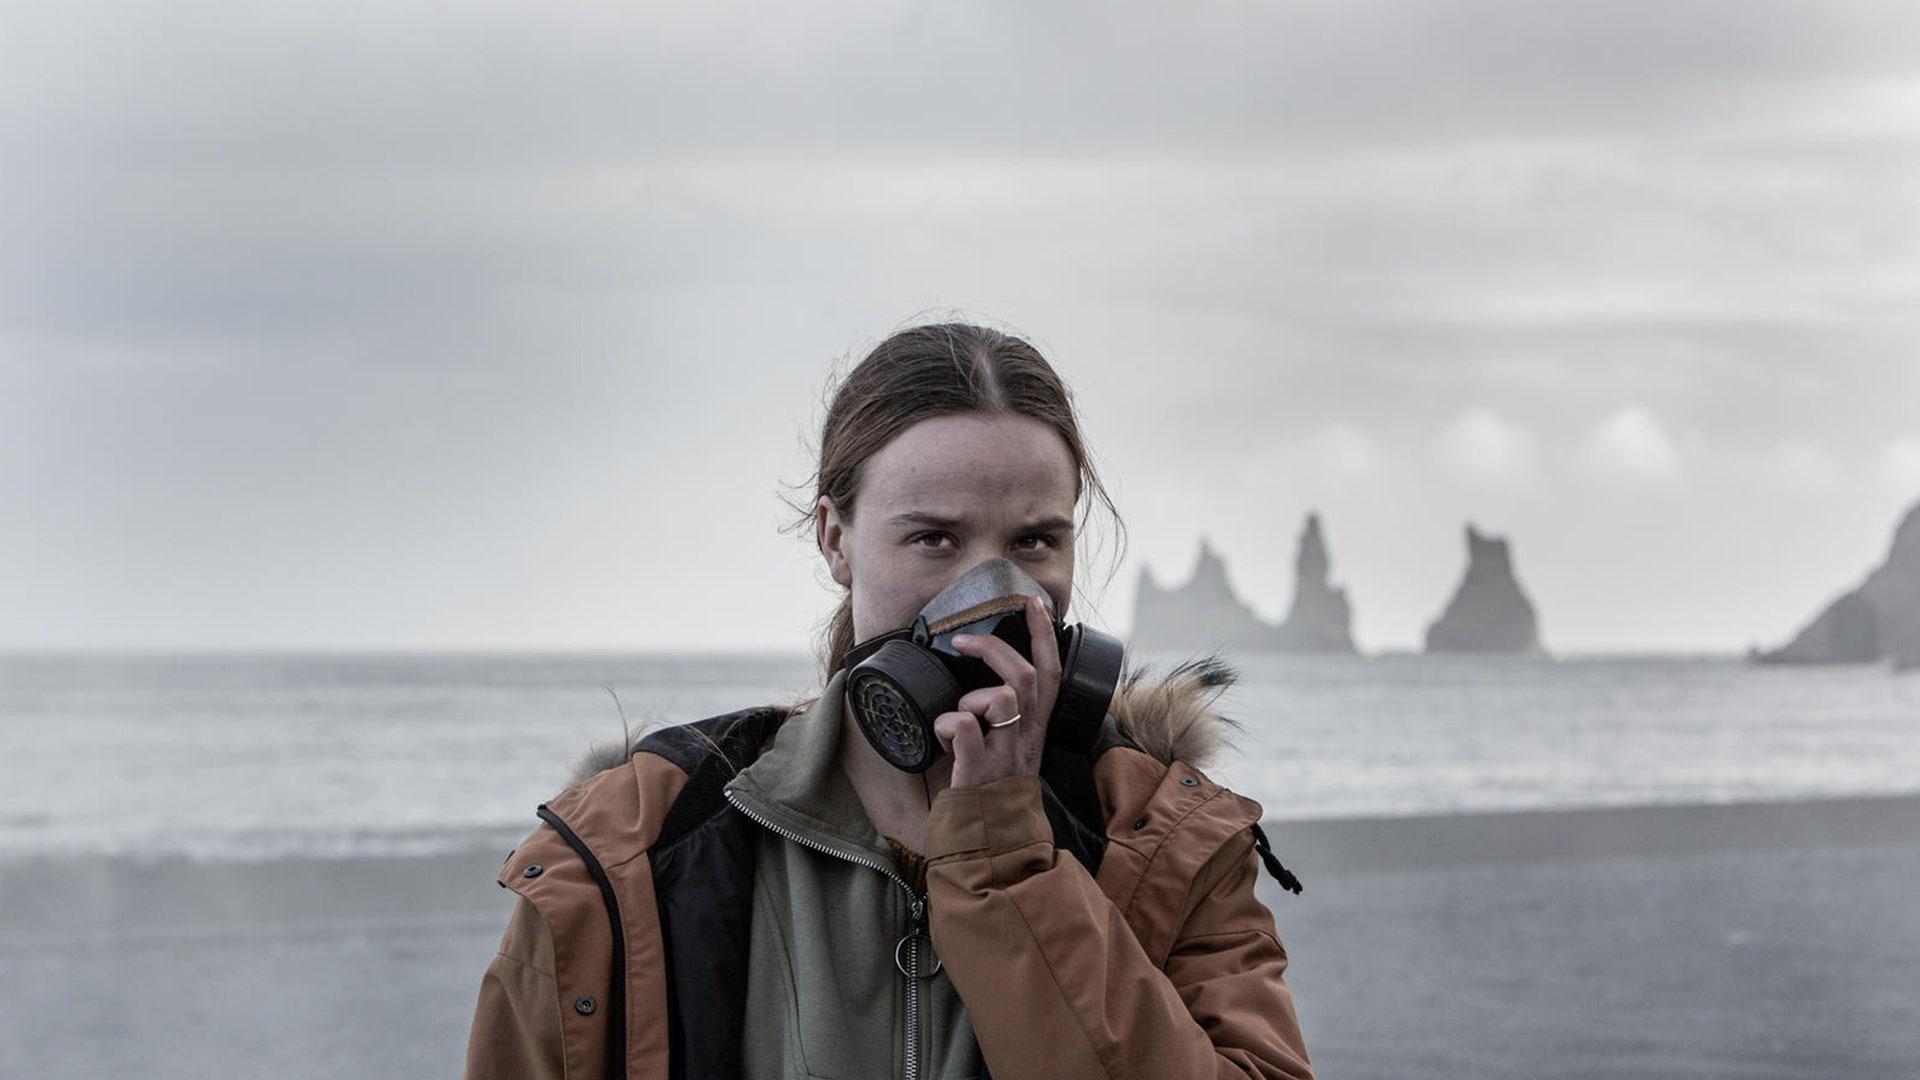 Katla Why Watch Icelands Intriguing Supernatural Series On